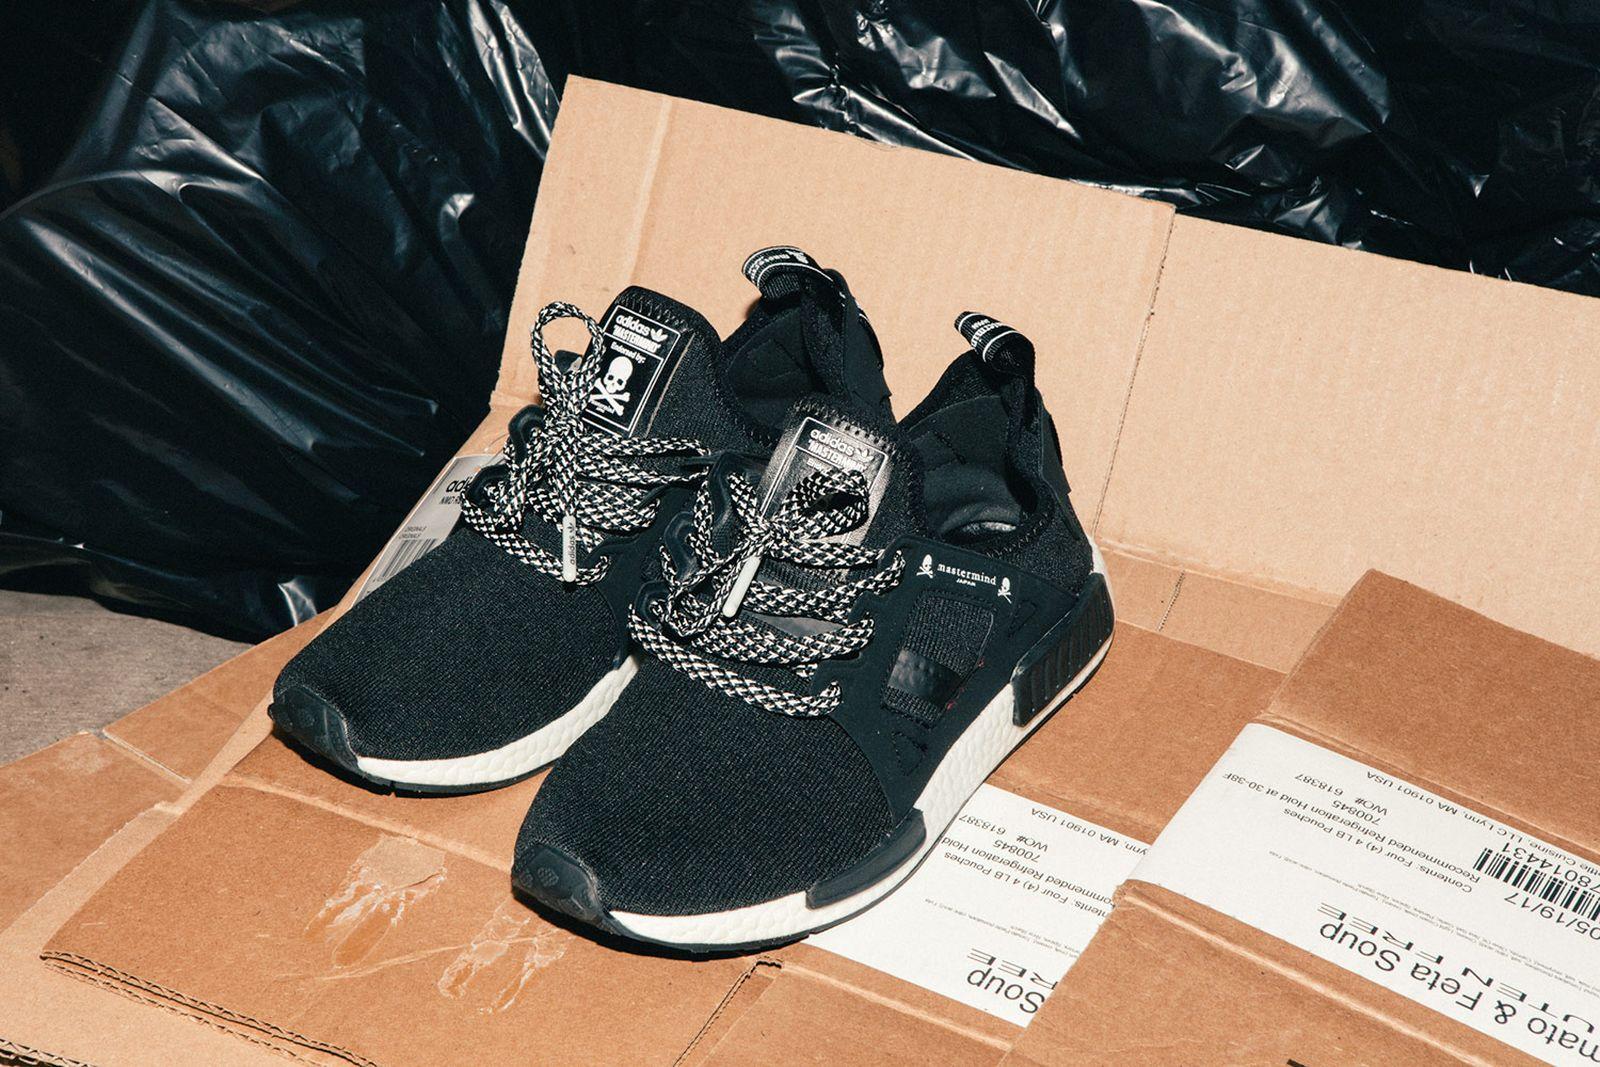 Legit-Check-Fake-Sneakers-Highsnobiety-14